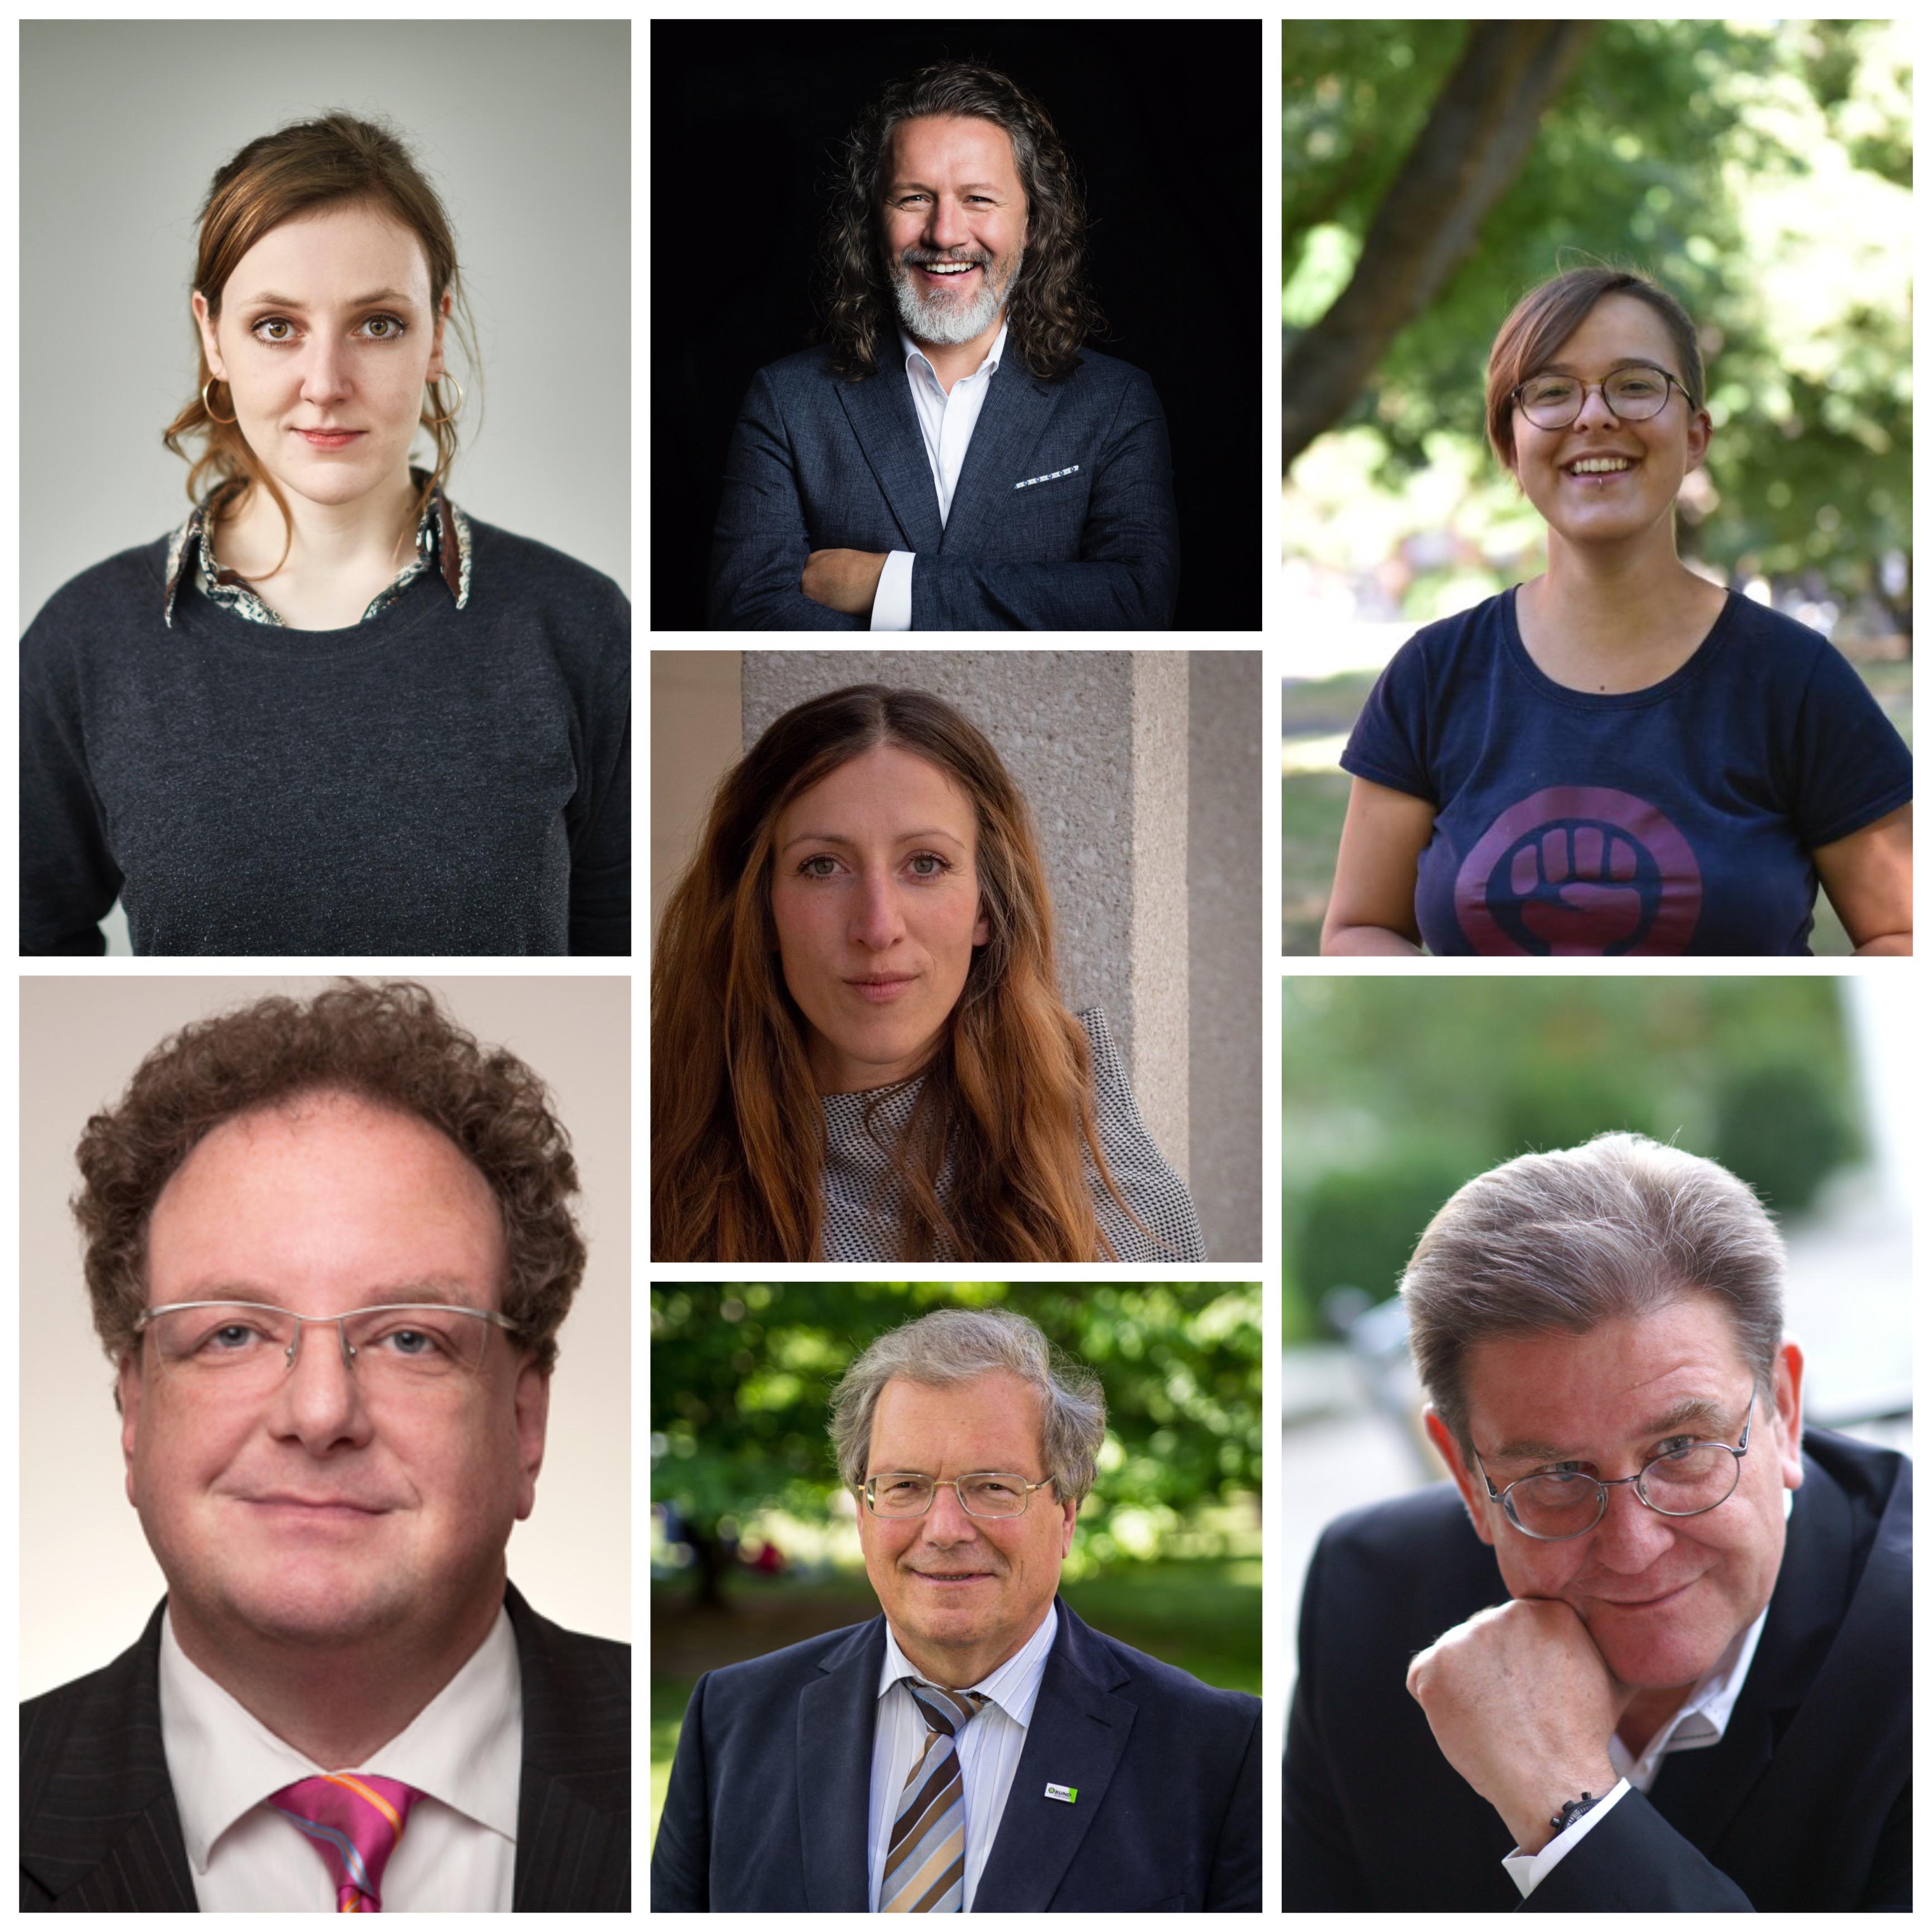 V.l.n.r.: Valerie Schönian, Mario Goldstein, Helene Helix Heyer, Simone Orgel, Olaf Zimmermann, Hubert Weiger, Theo Geißler